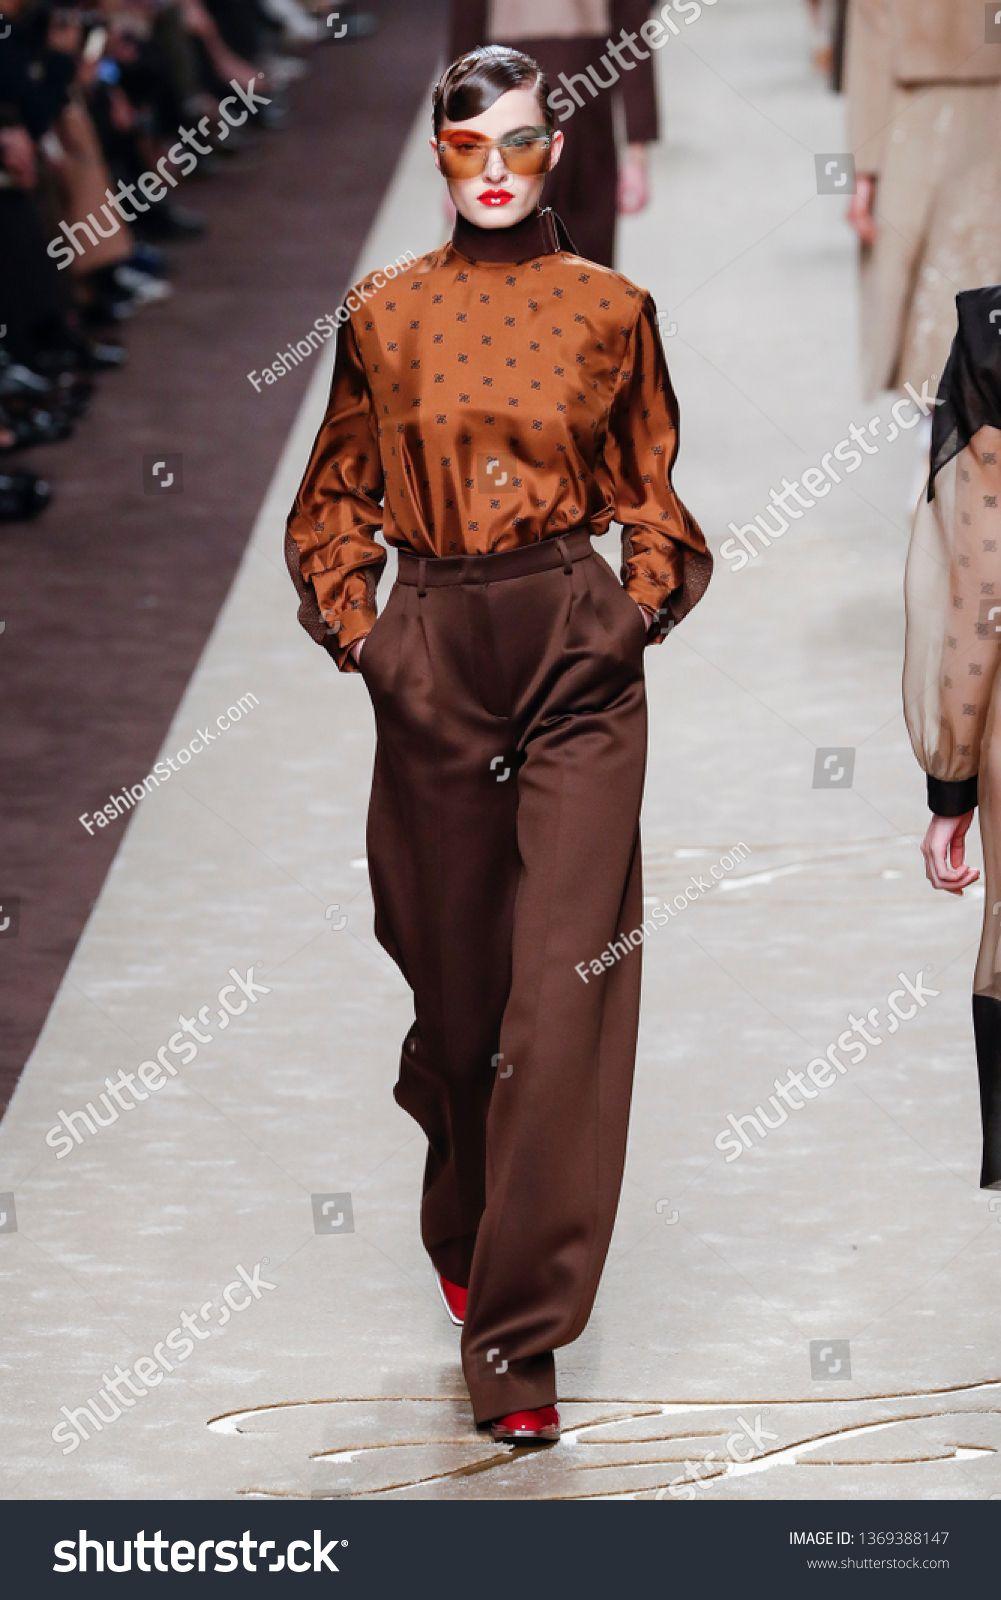 MILAN ITALY  FEBRUARY 21 A model walks the runway at the Fendi show at Milan Fashion Week Autumnu002FWinter 2019u002F20 on February 21 2019 in Milan Italy